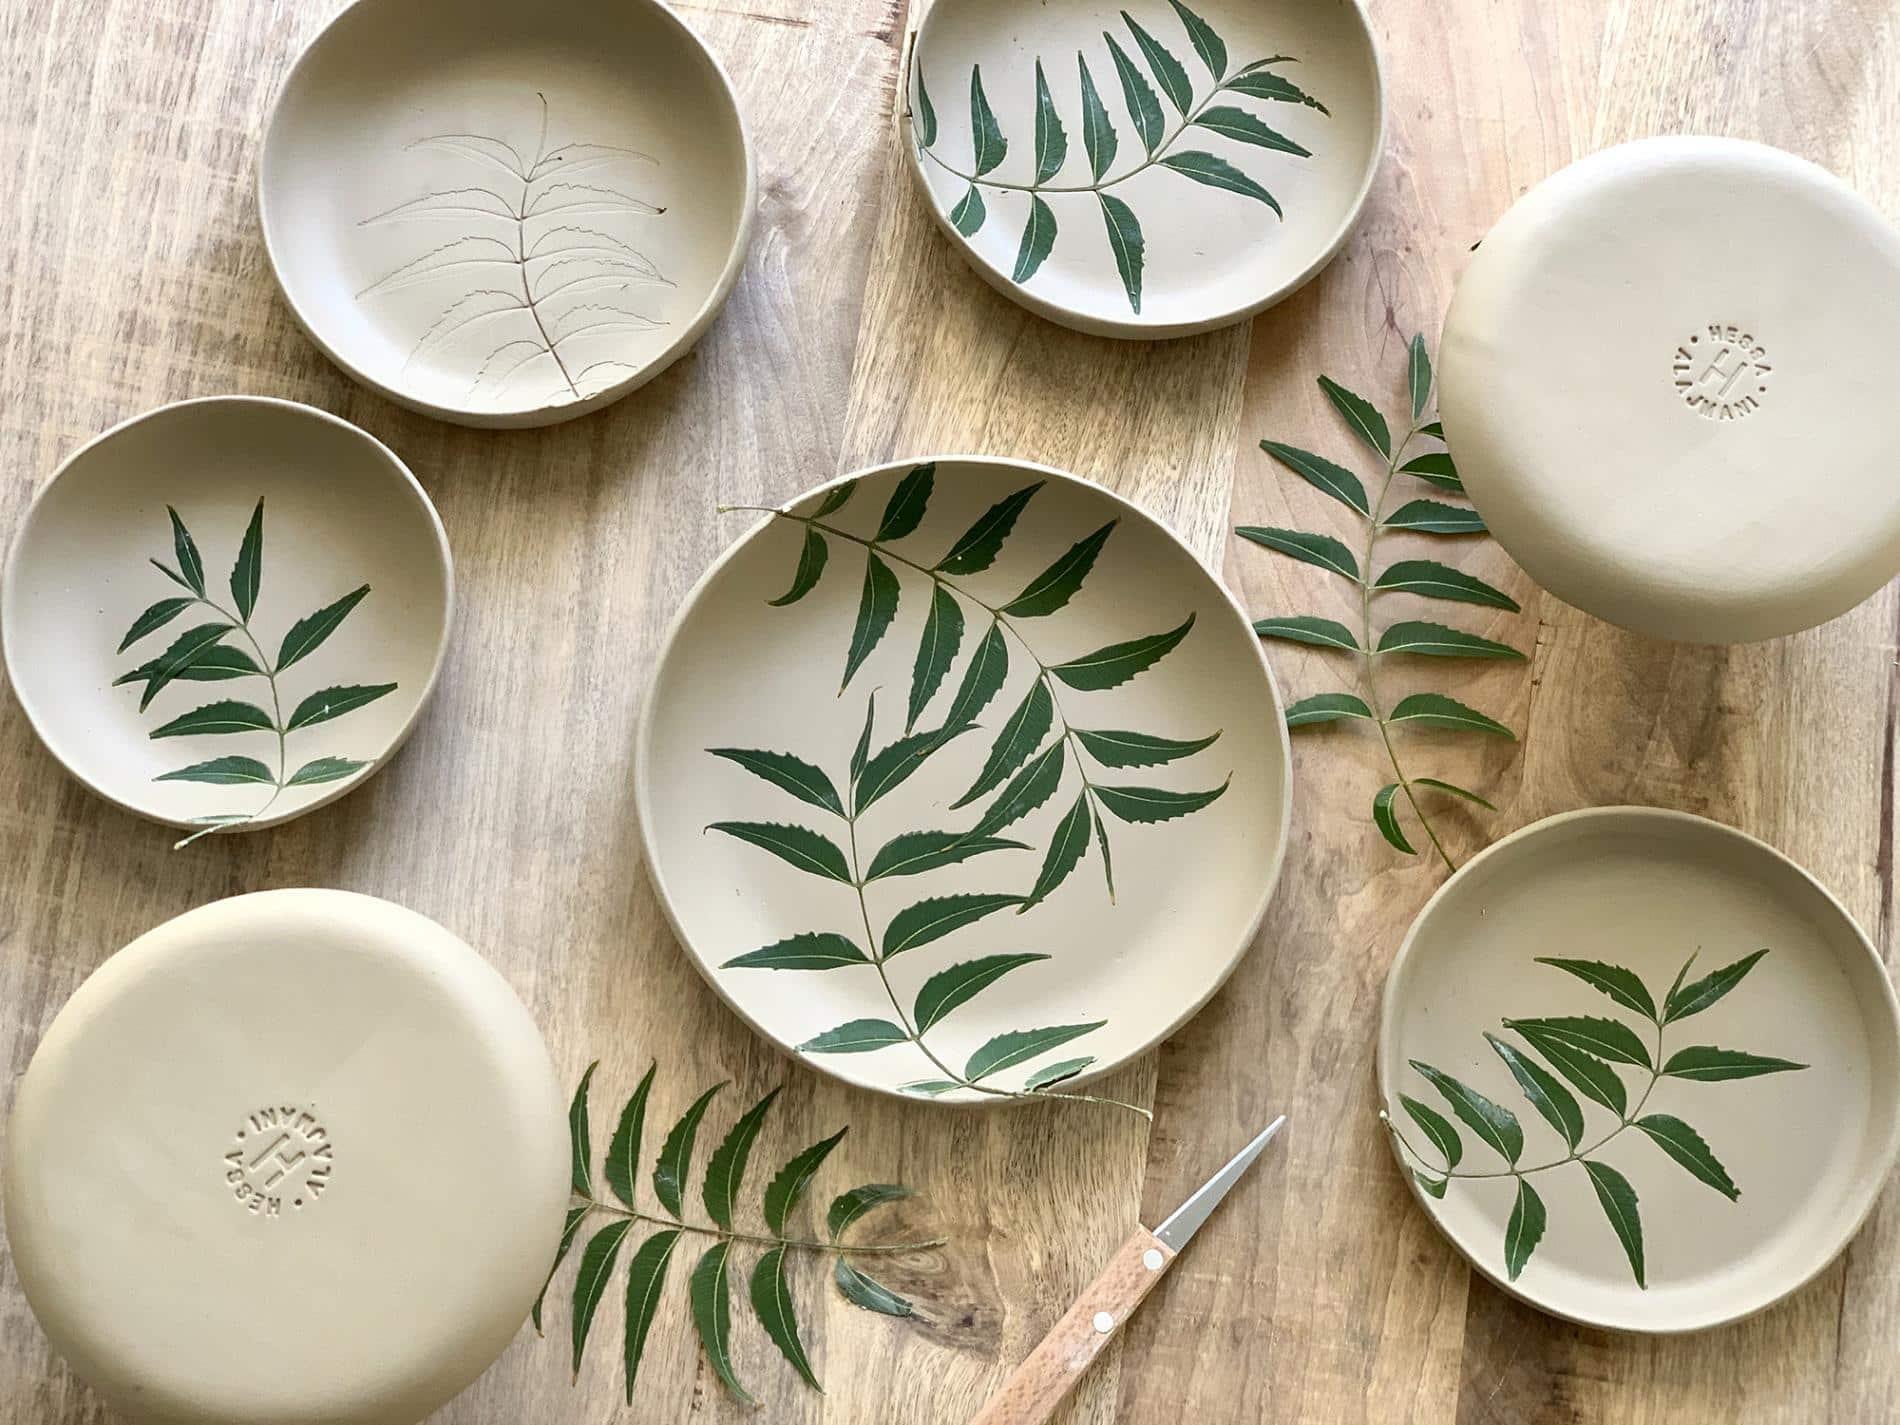 Hessa Al Ajmani taza ceramica vajilla platos hojas